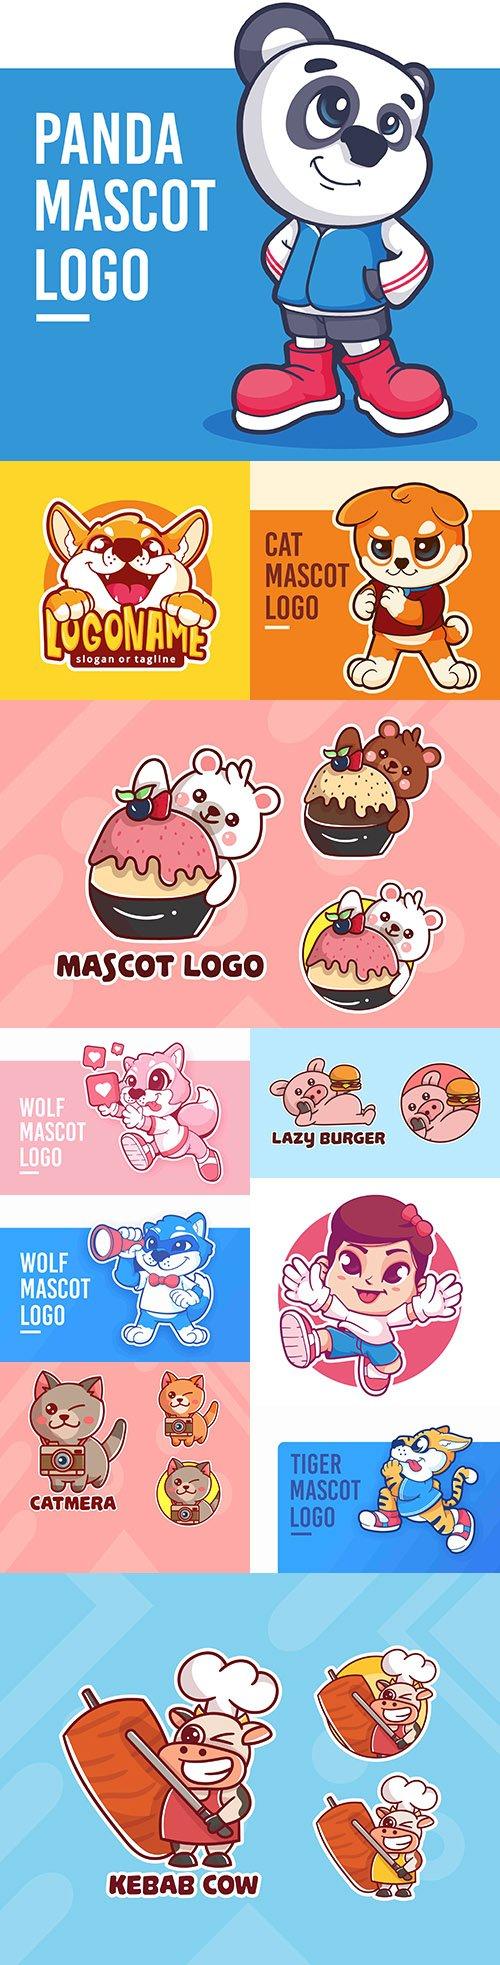 Emblem mascot and Brand name logos design 16